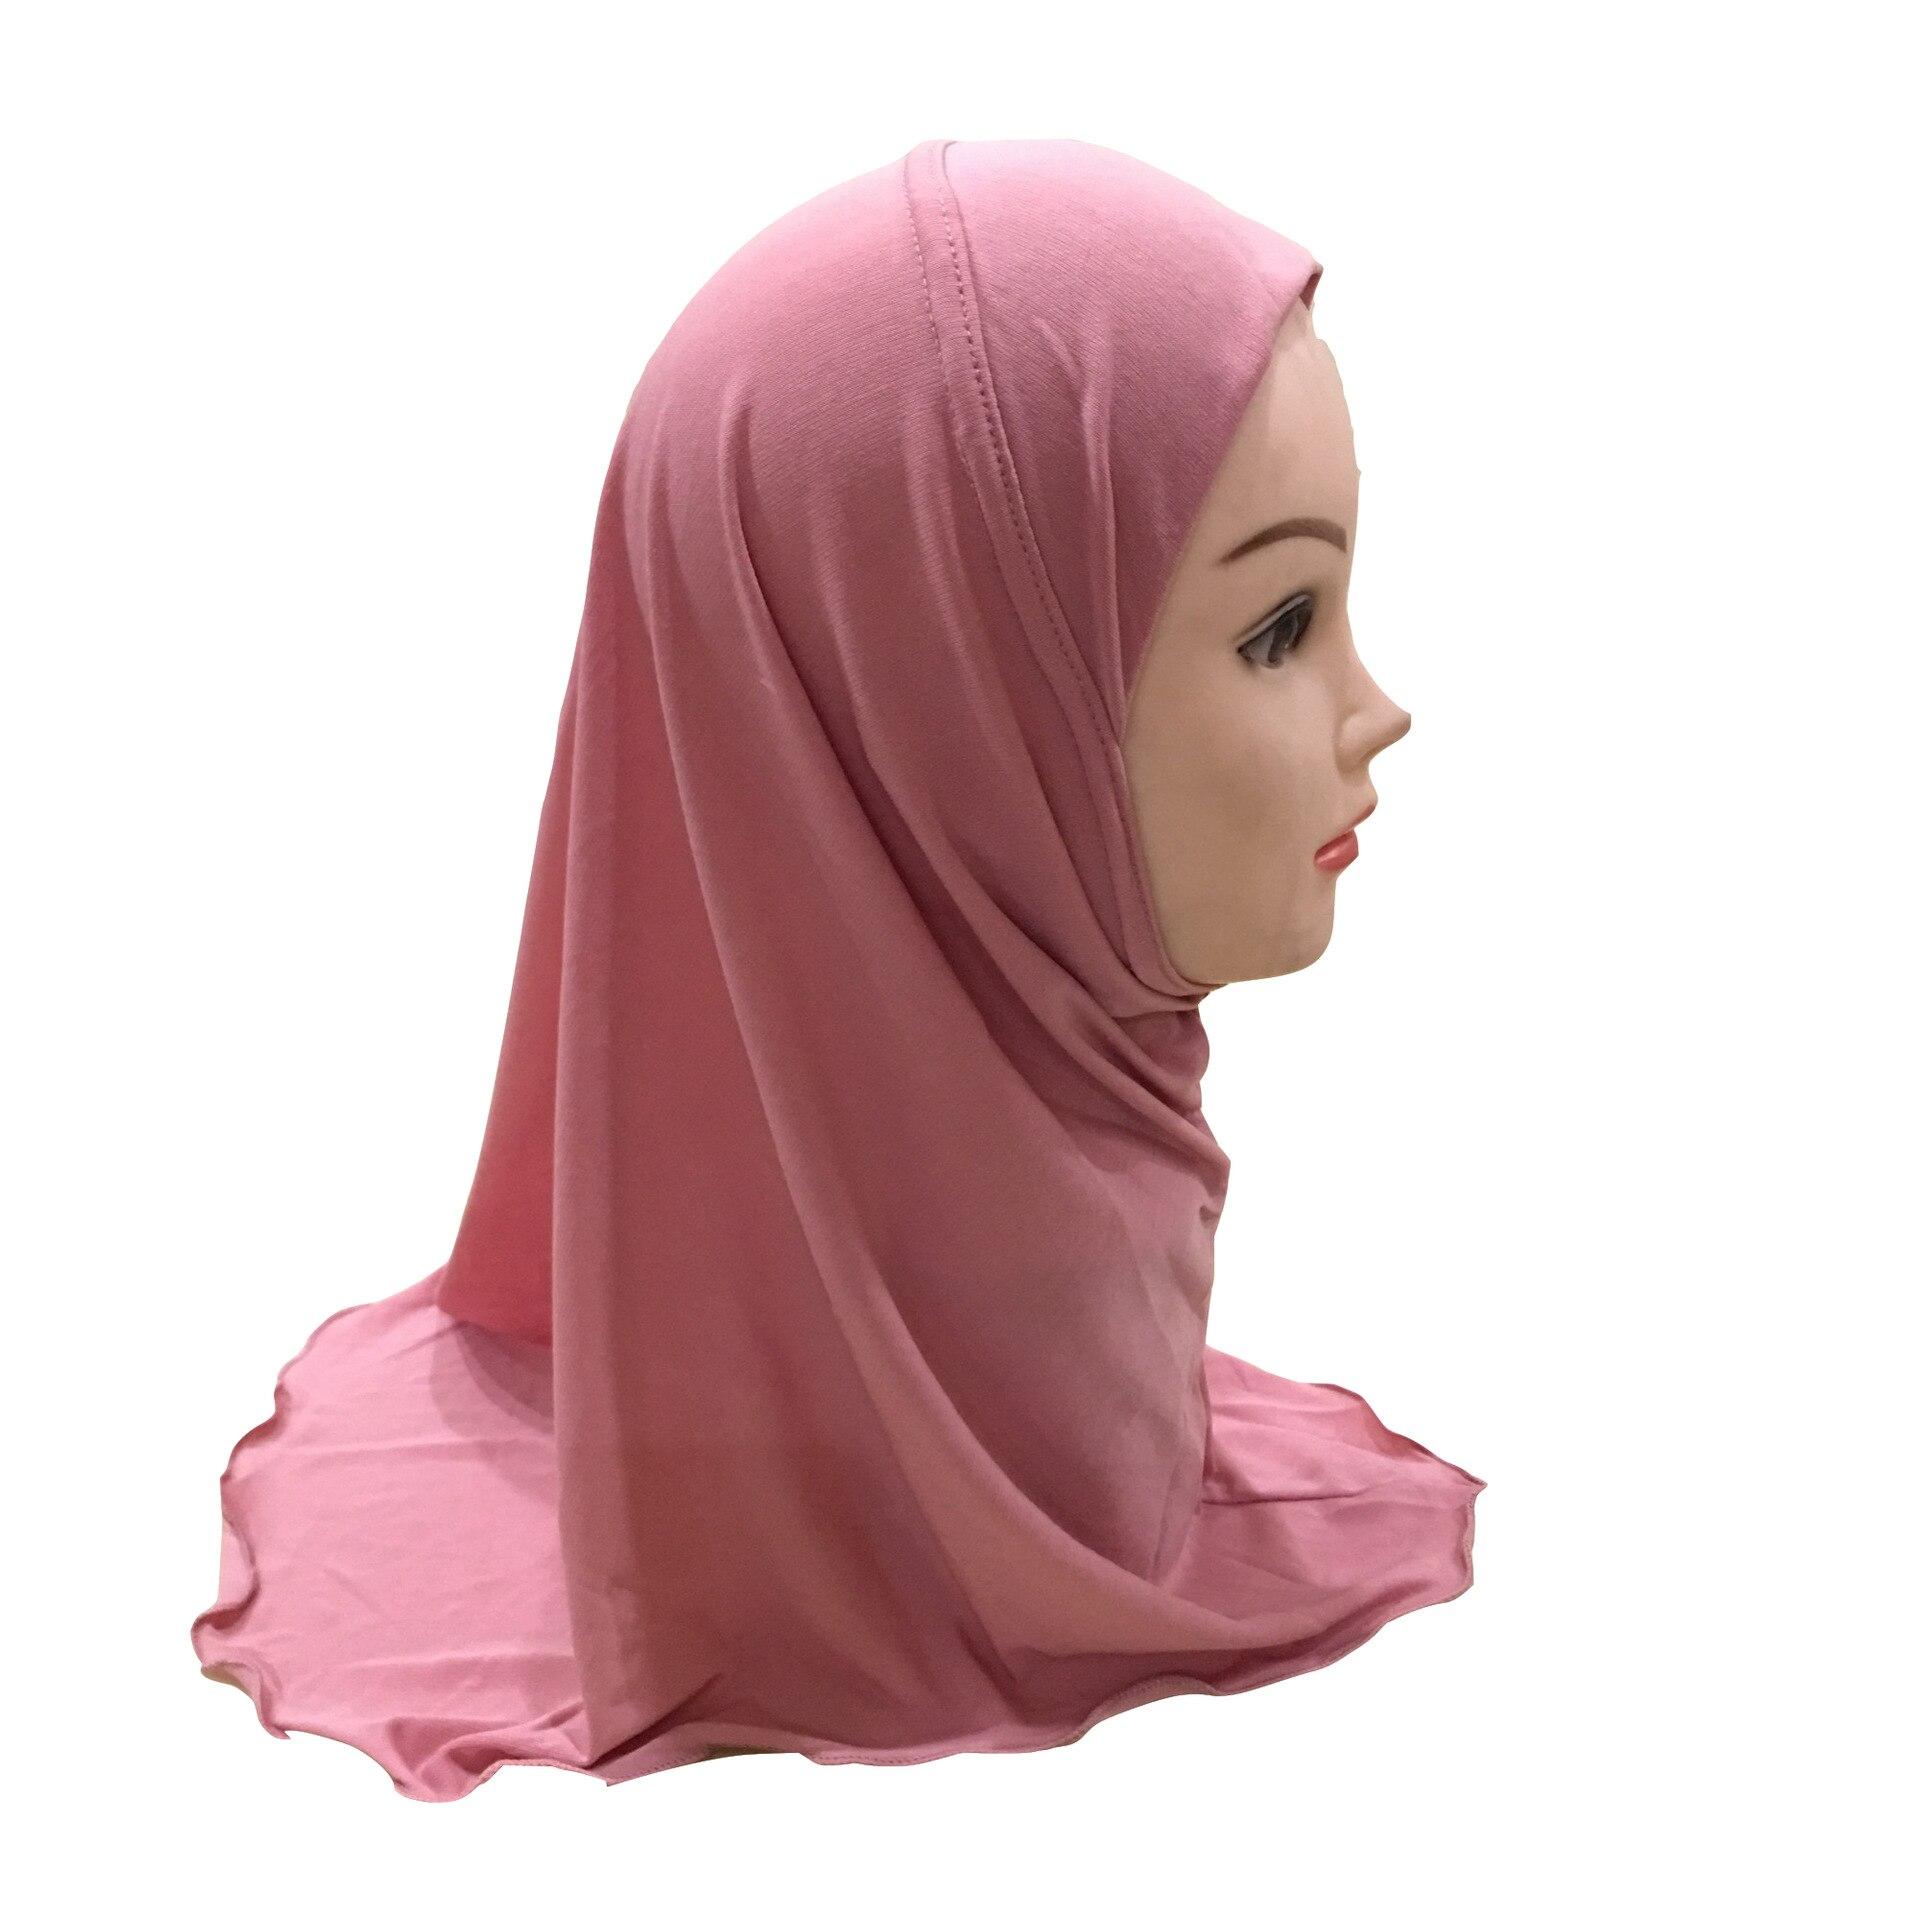 One-piece ECrystal Hemp Girls Amira Headscarf Muslim Instant Hijabs Plain Color Head Wrap For Kids 2-7 Years Old Ready To Wear